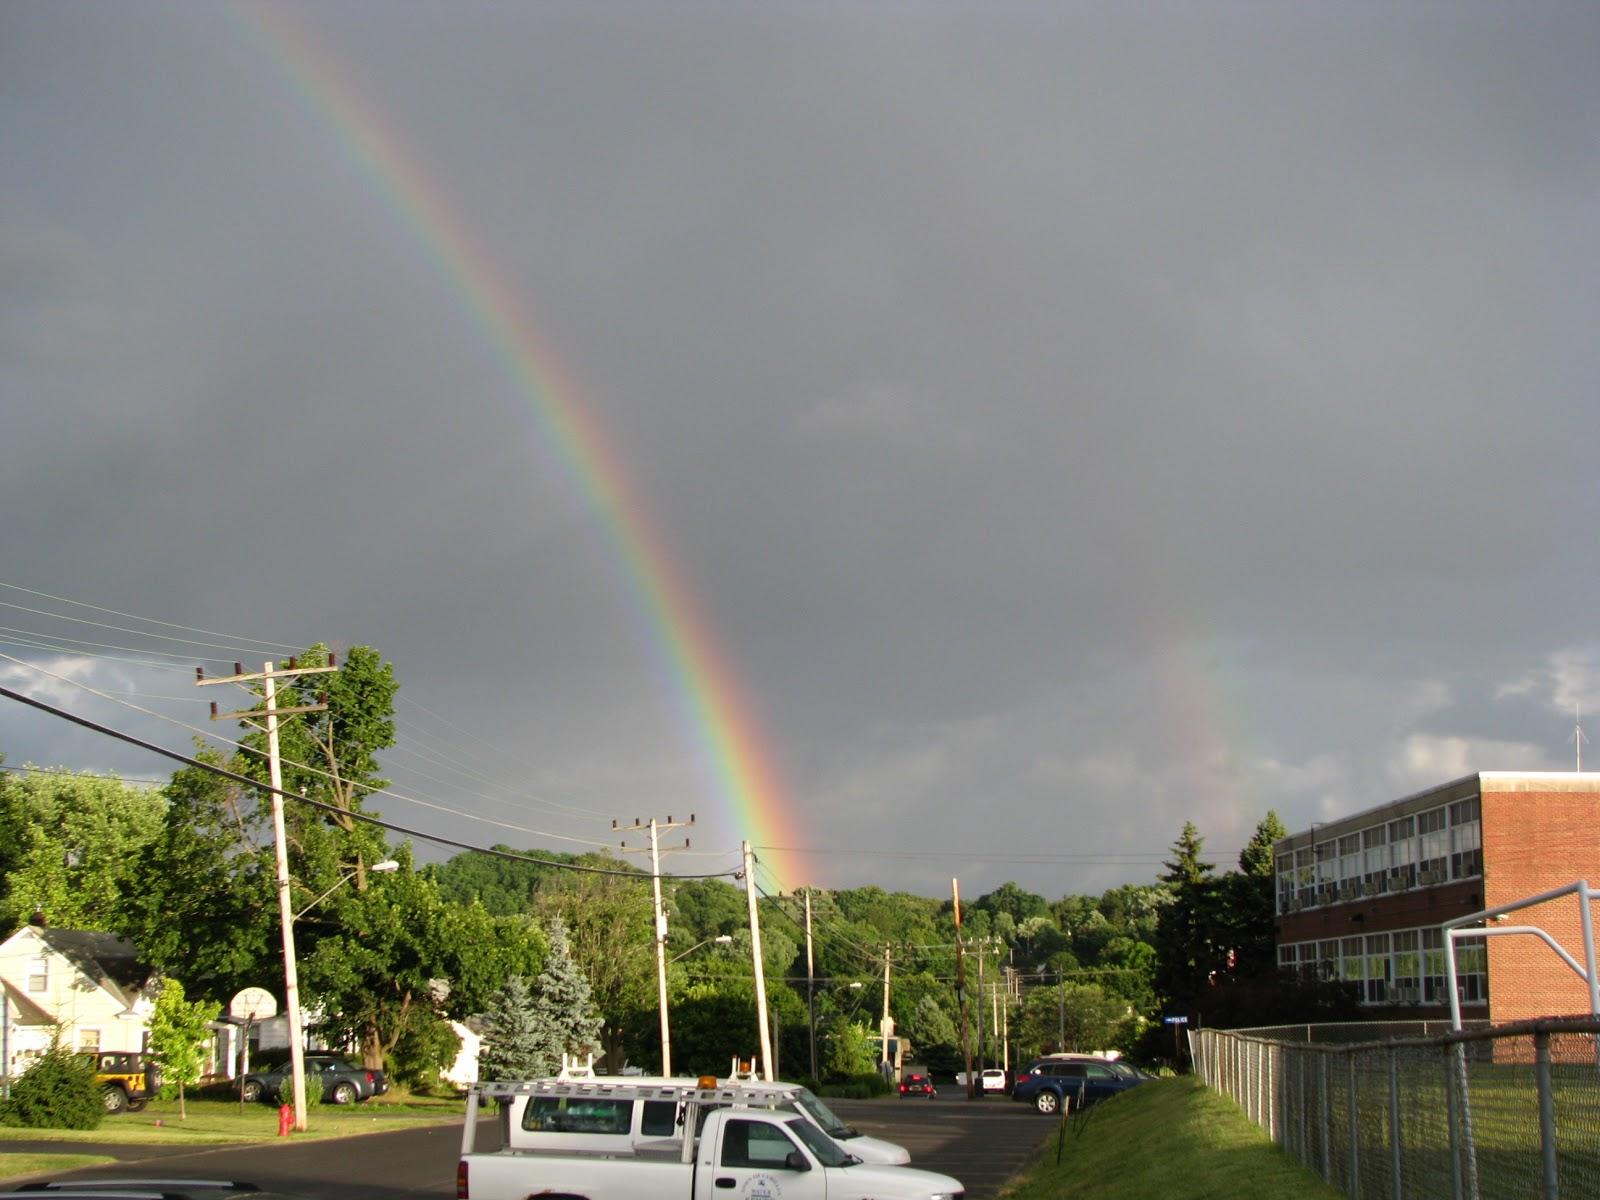 Terri S Terrifical Terrace Rainbows Big Girl And Day Old Balloons